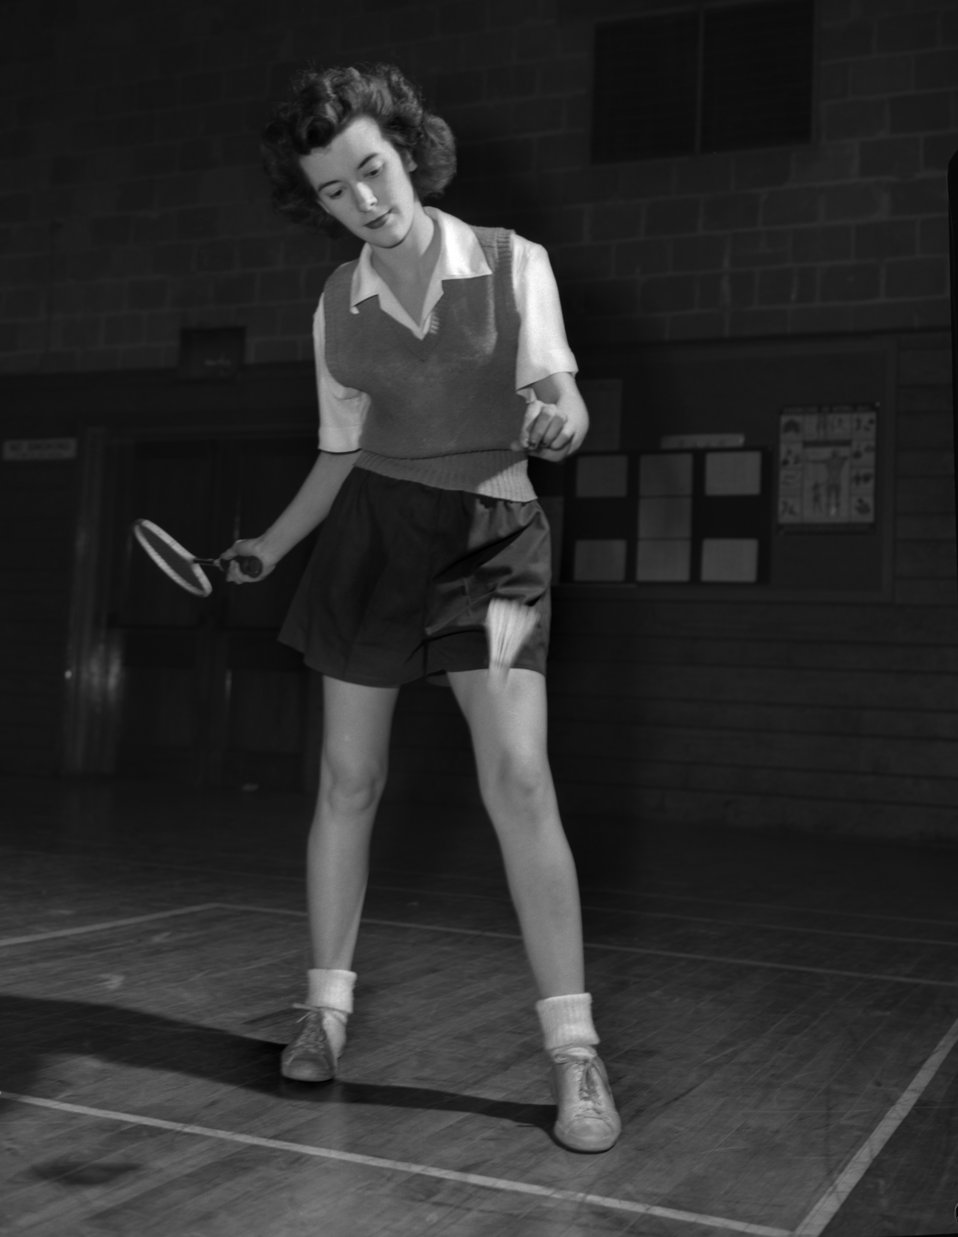 Jean Harampolis Playing Badminton Oak Ridge